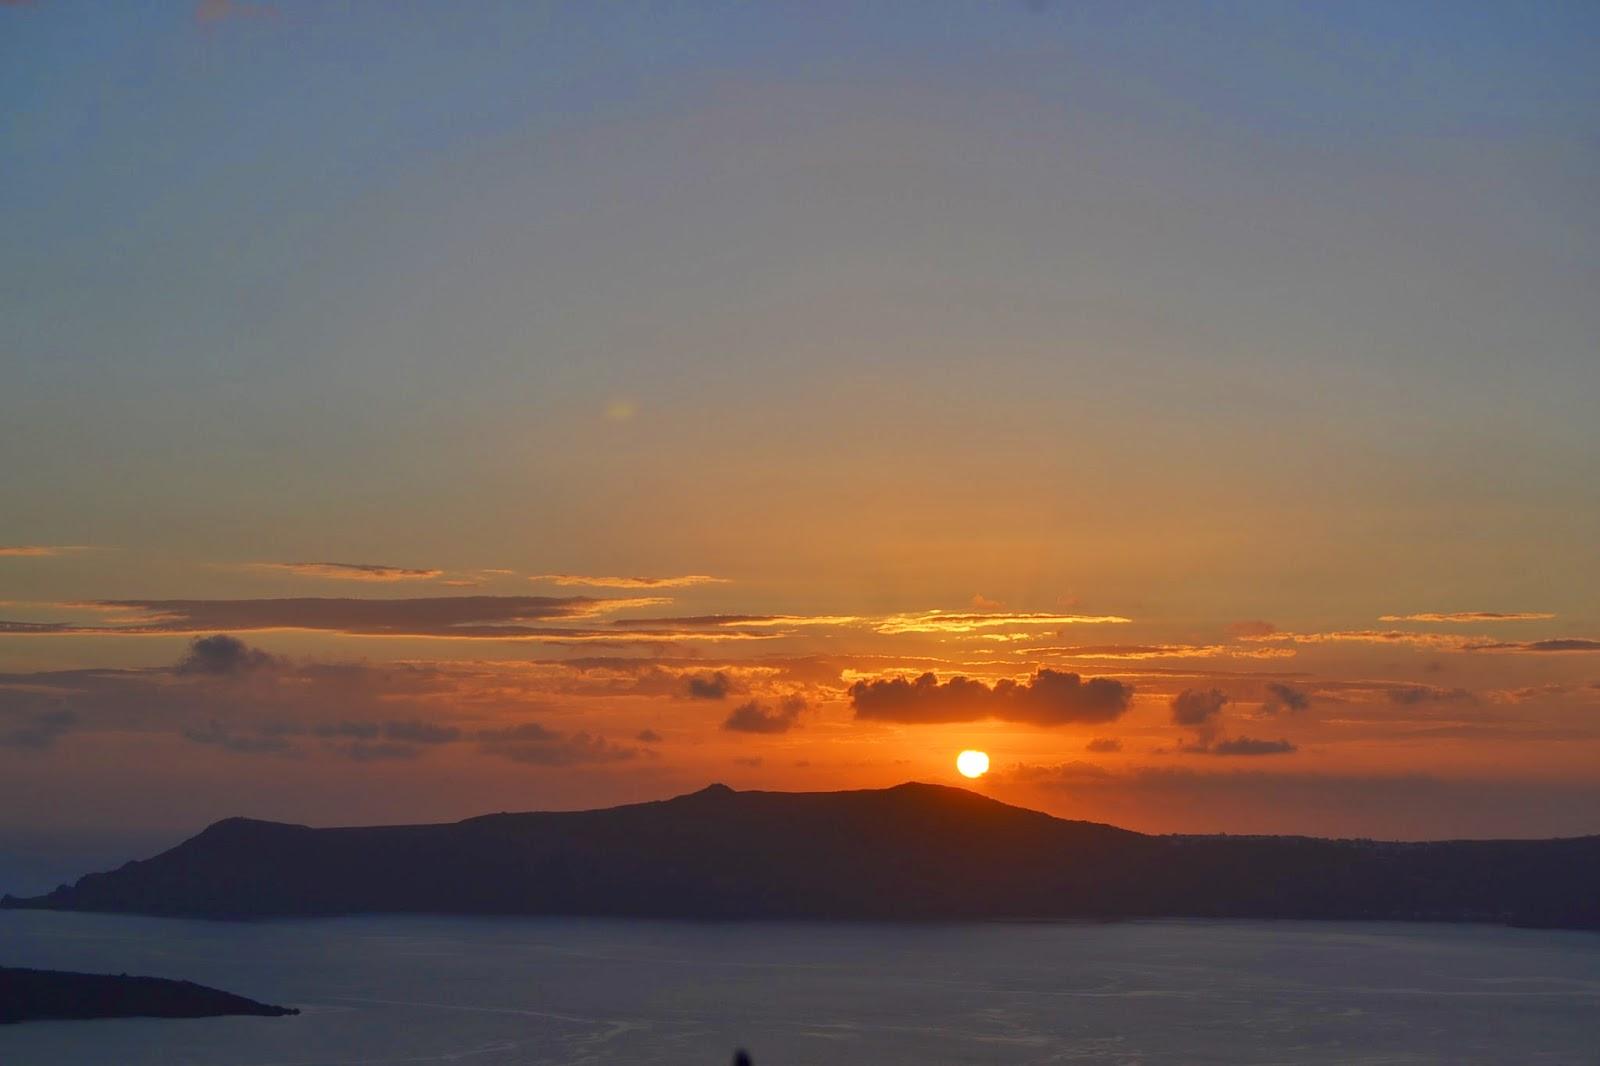 http://www.syriouslyinfashion.com/2014/11/magic-sunset-in-santorini.html